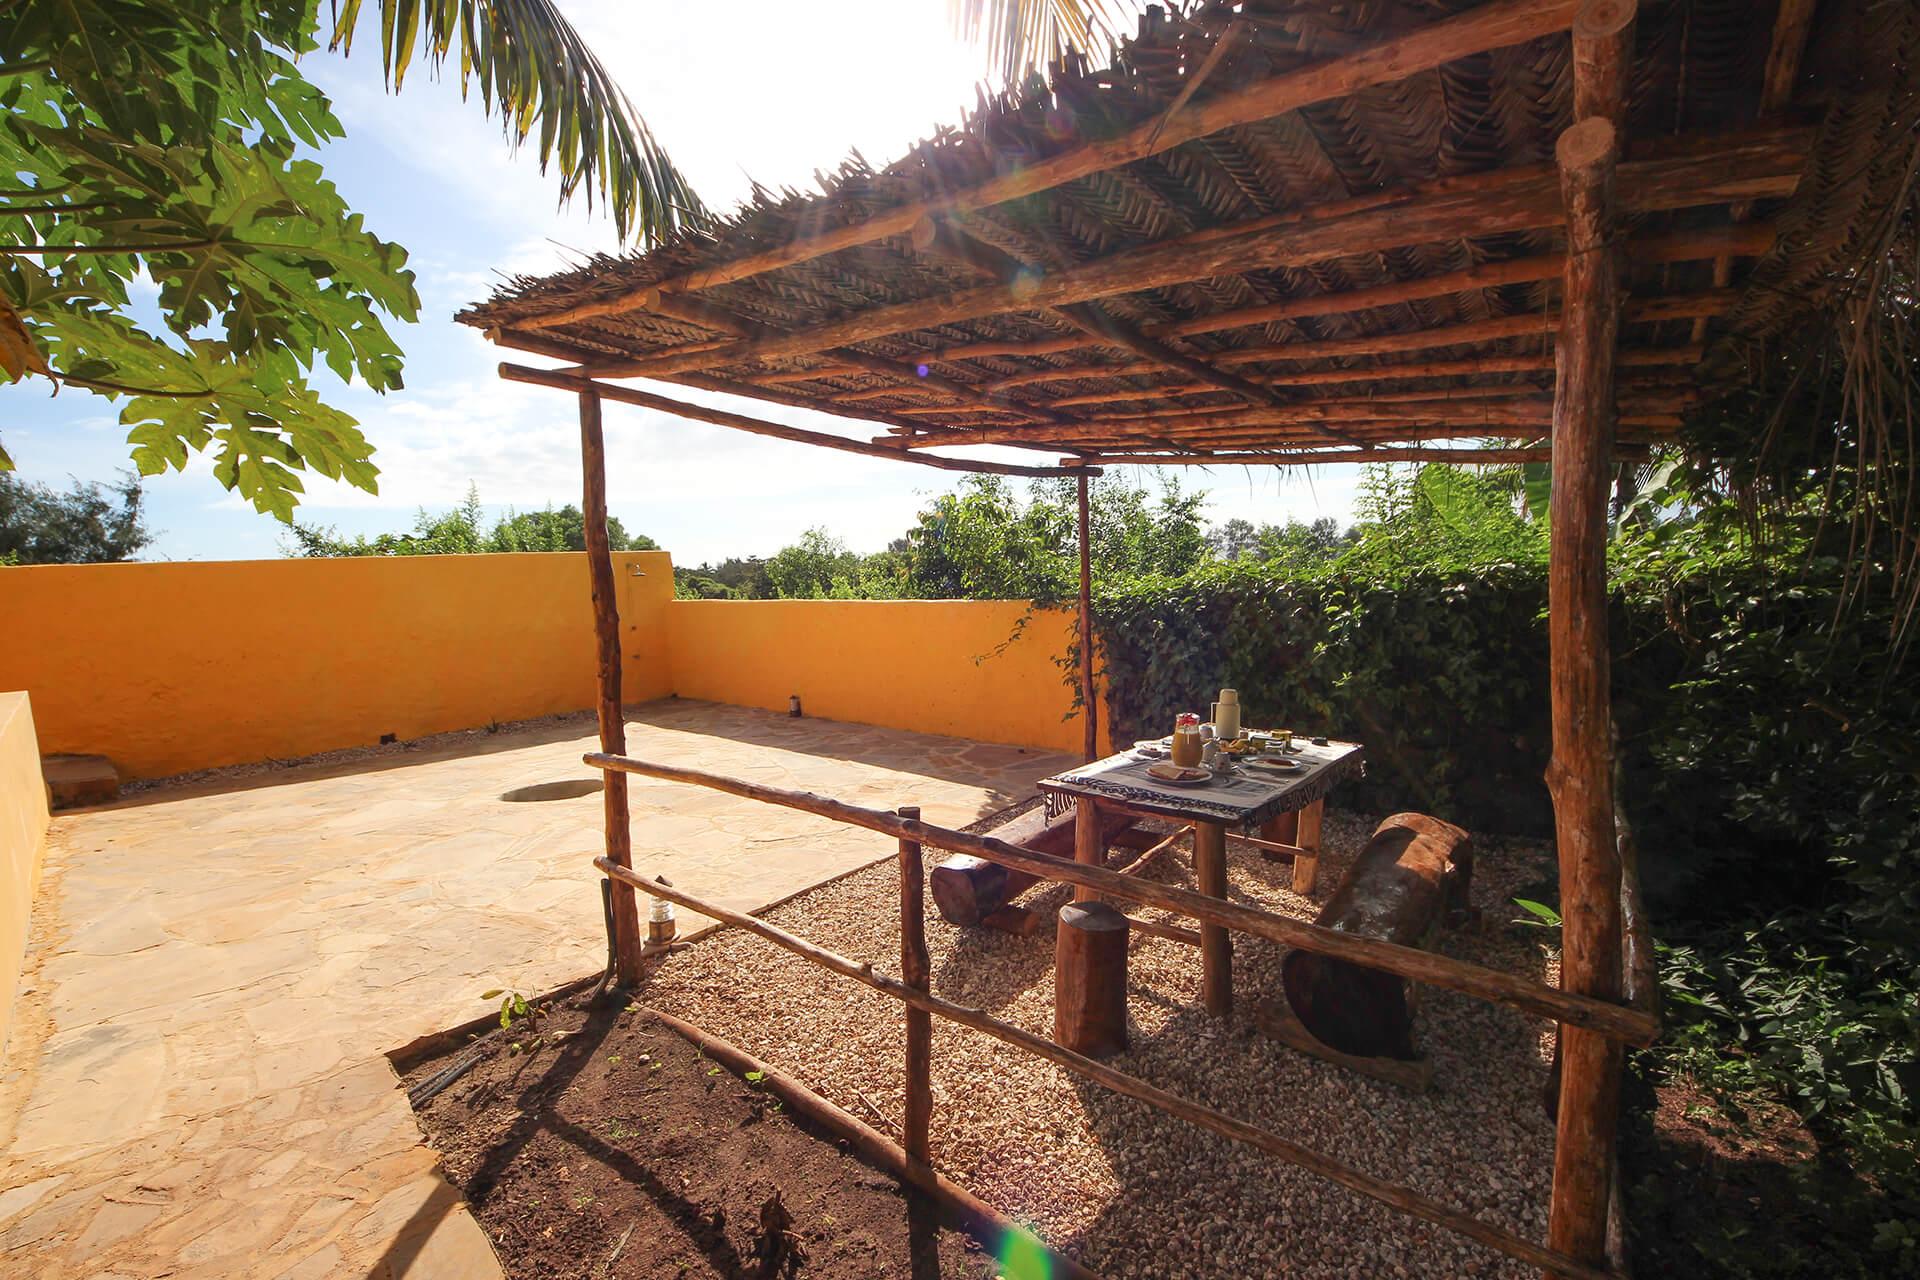 Appartamenti con gazebo Maisha Marefu a Kiwengwa Zanzibar